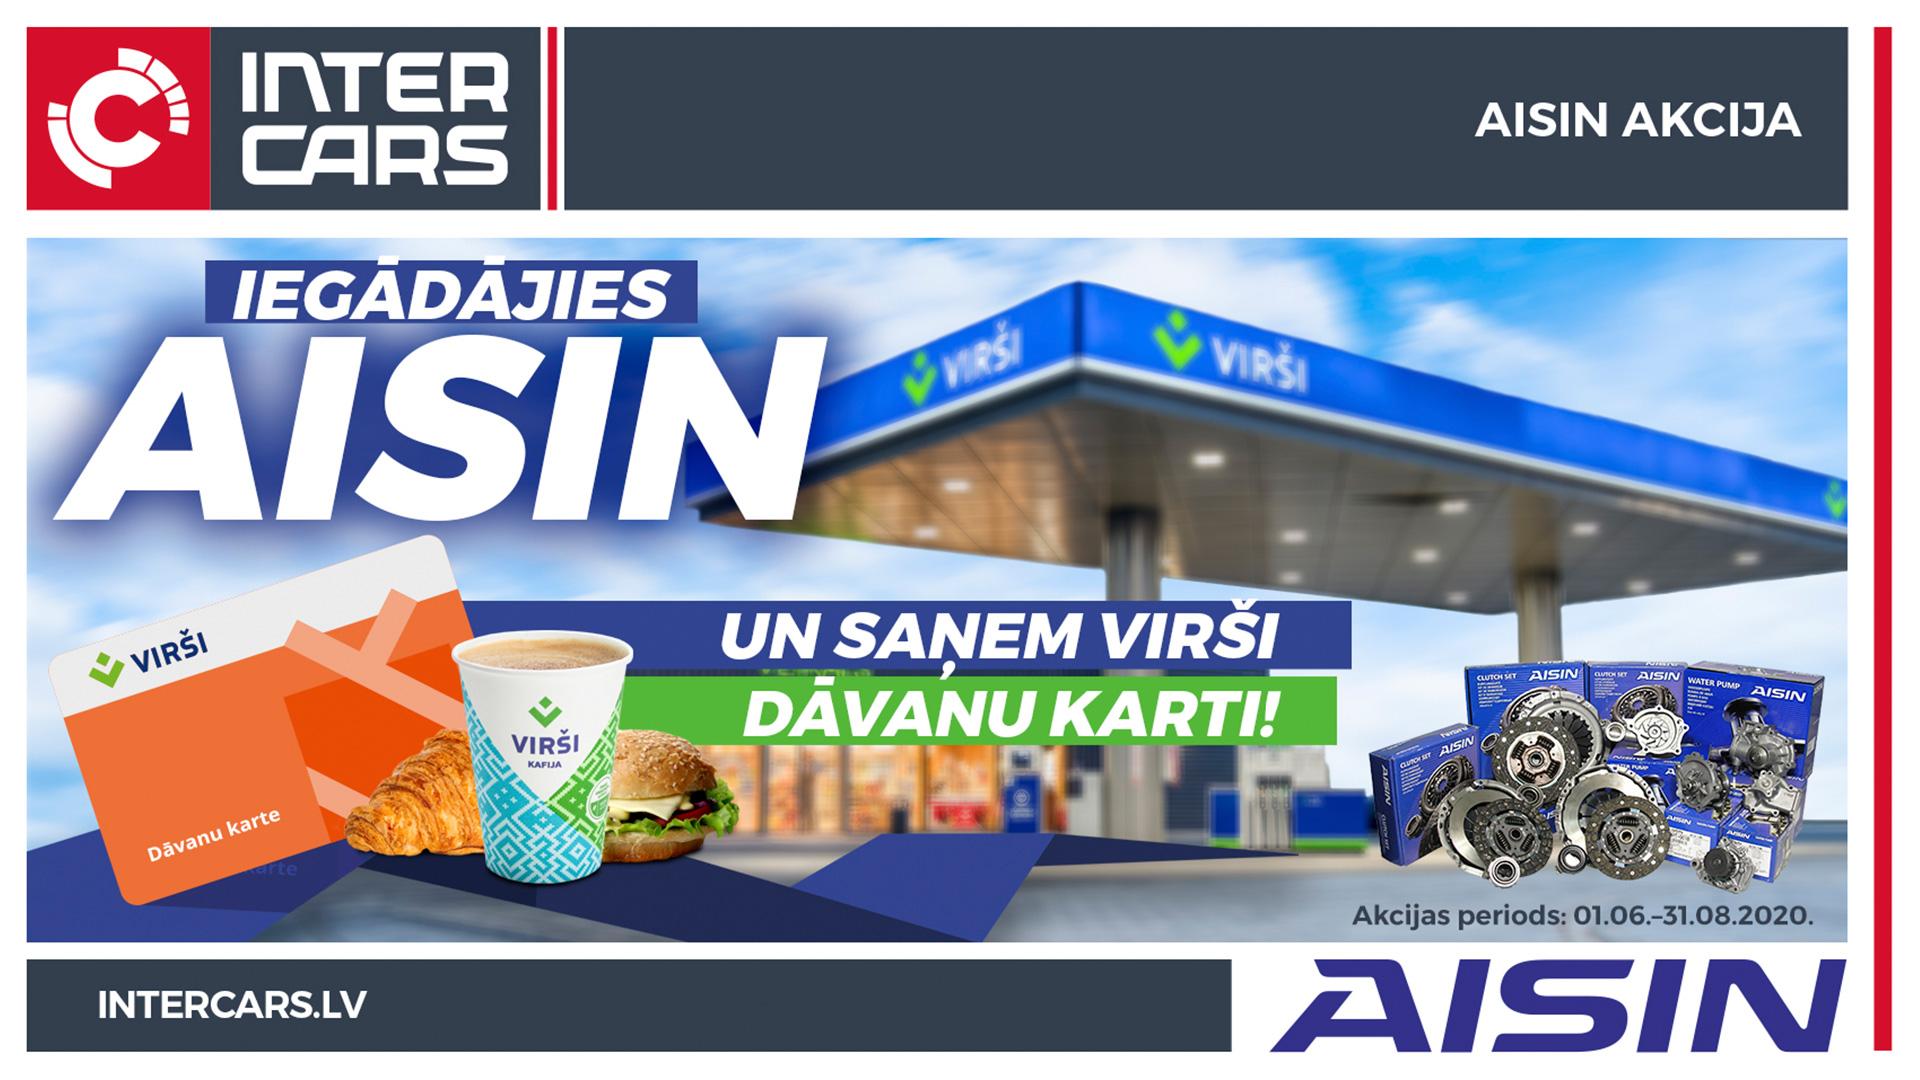 aisin-akcija-aug2020-CRM-B.jpg